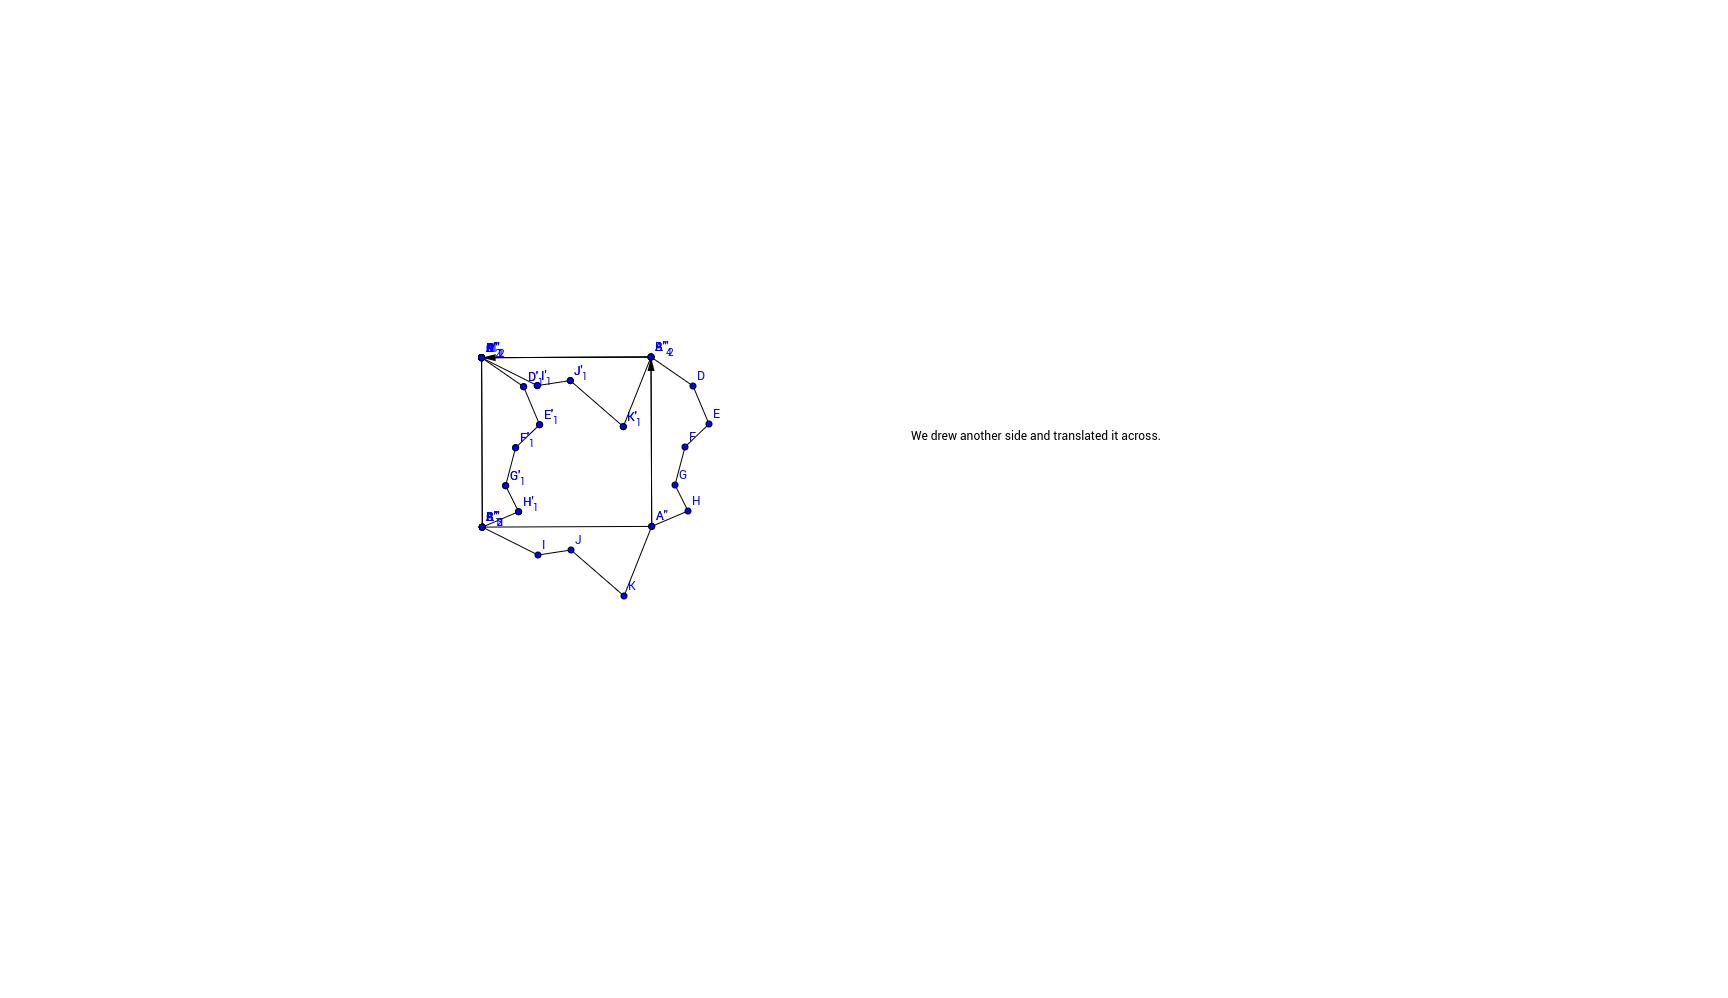 tessellation 1 step 4